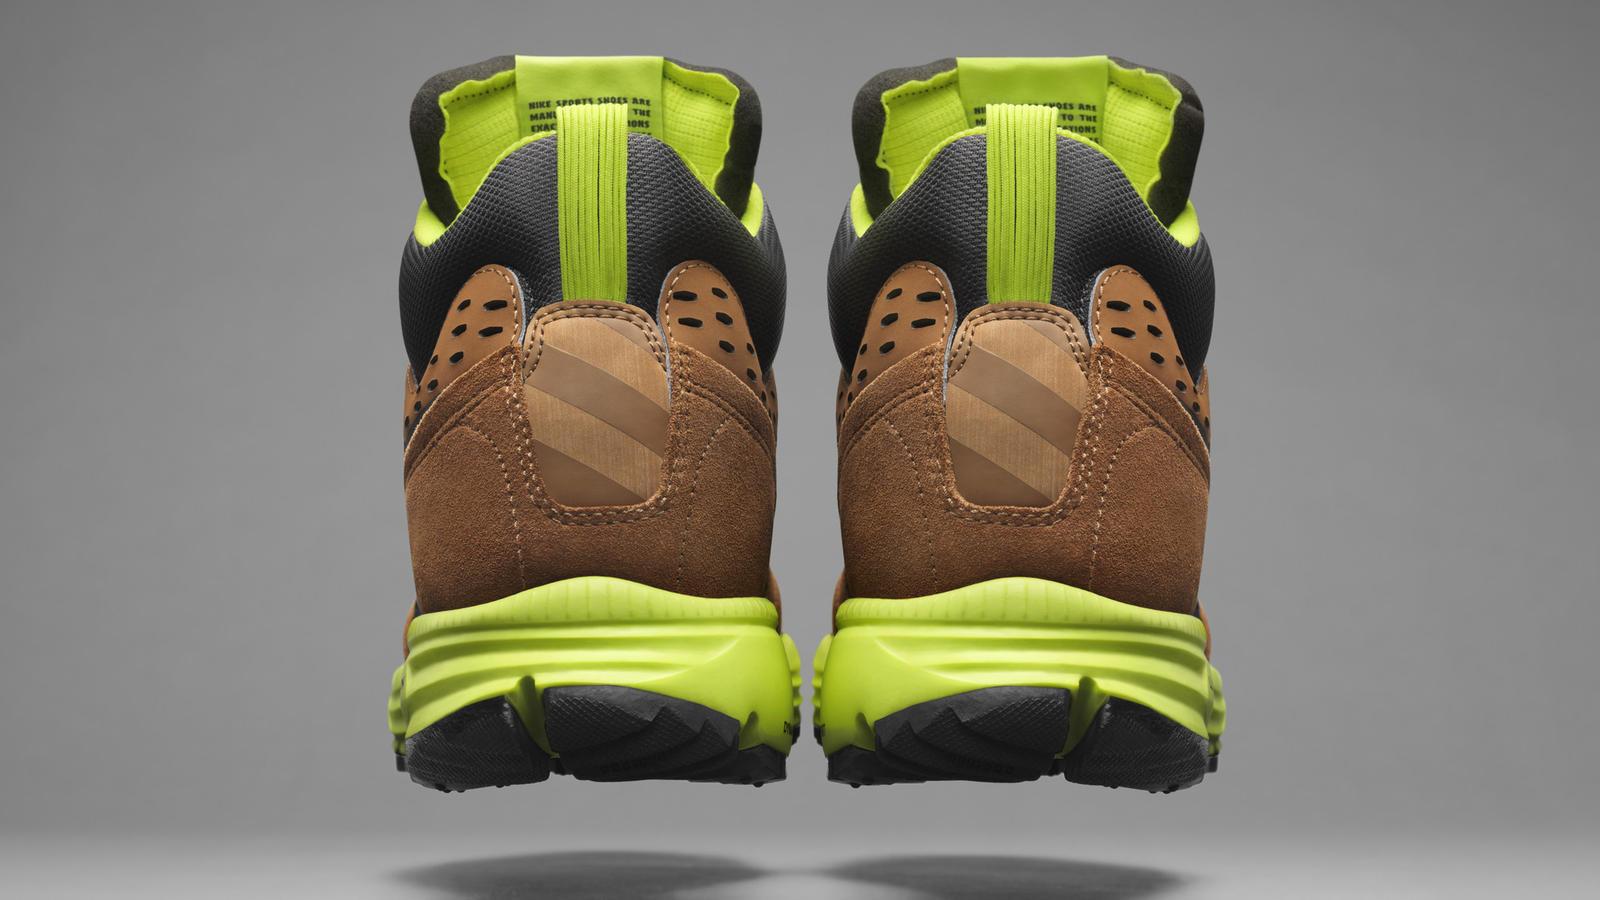 ho13_nsw_sneakerboots_lunar_d2_v1_ng